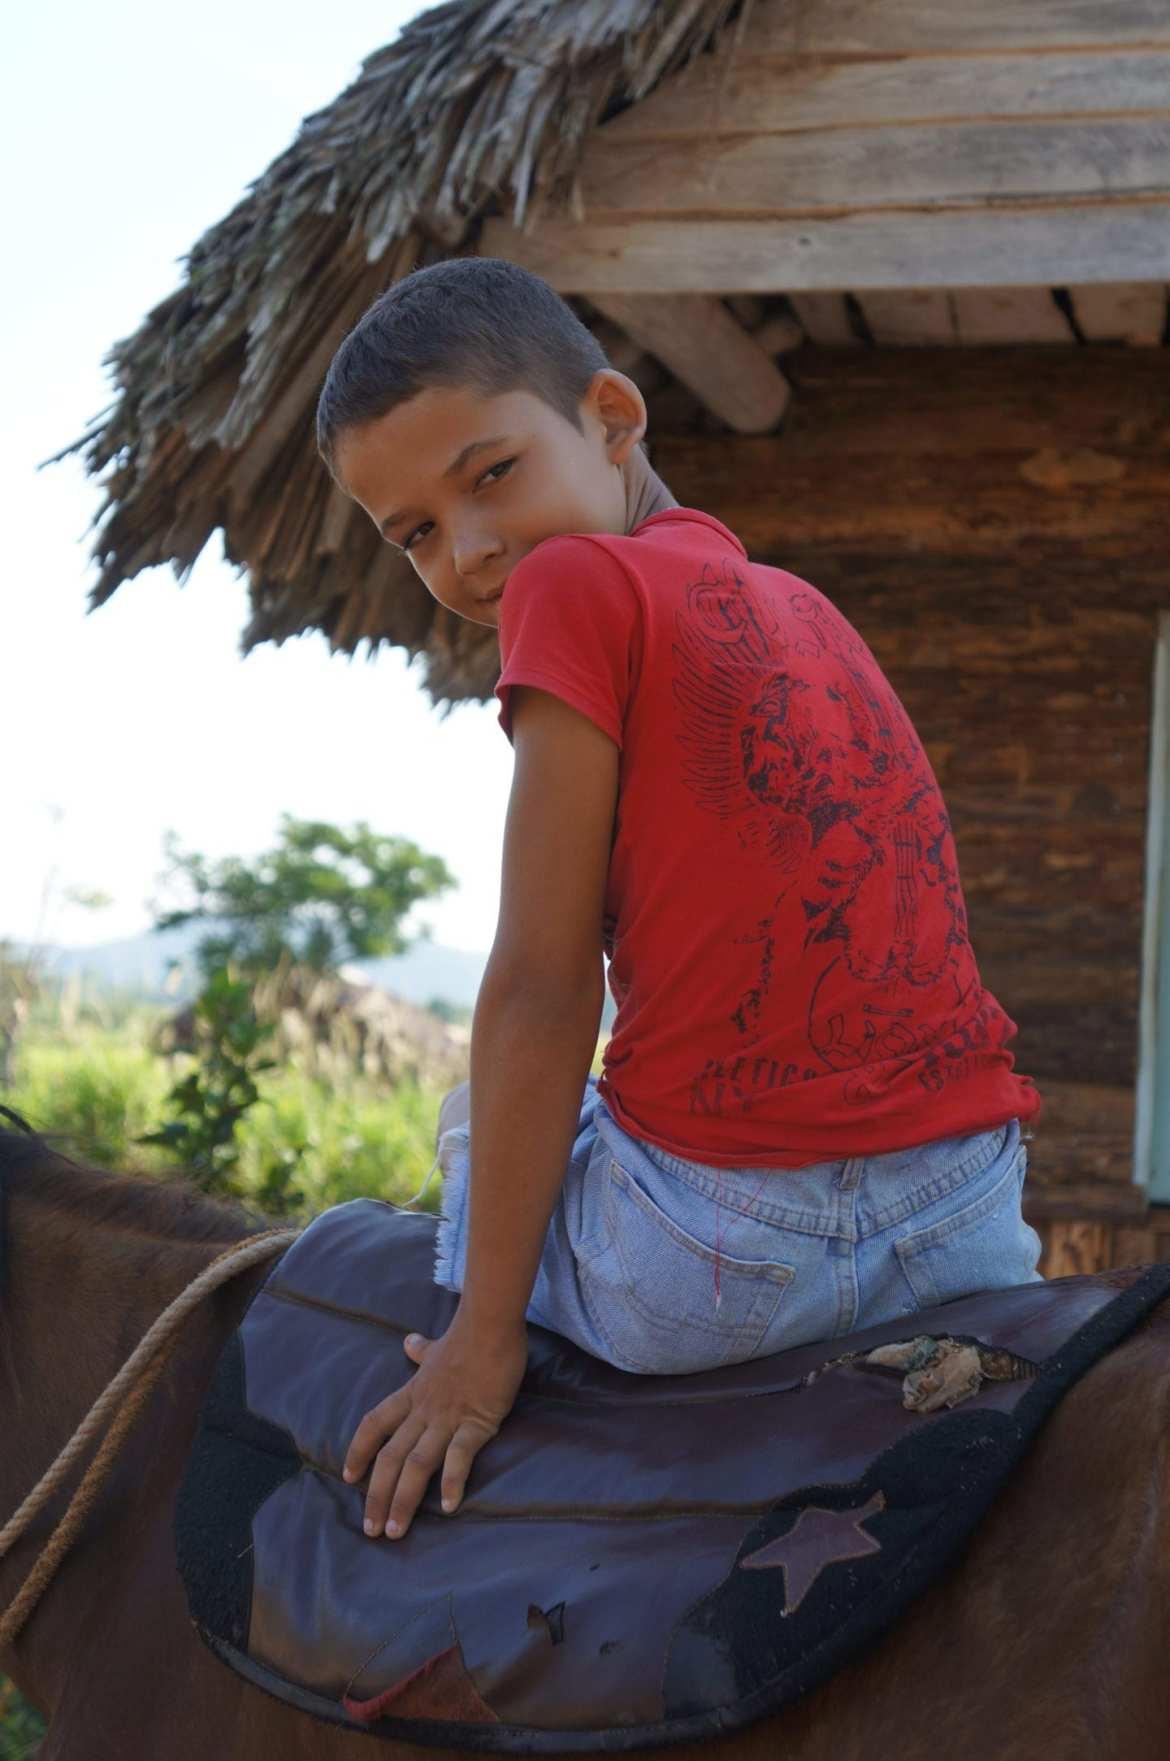 boy on a horse in vinales, cuba